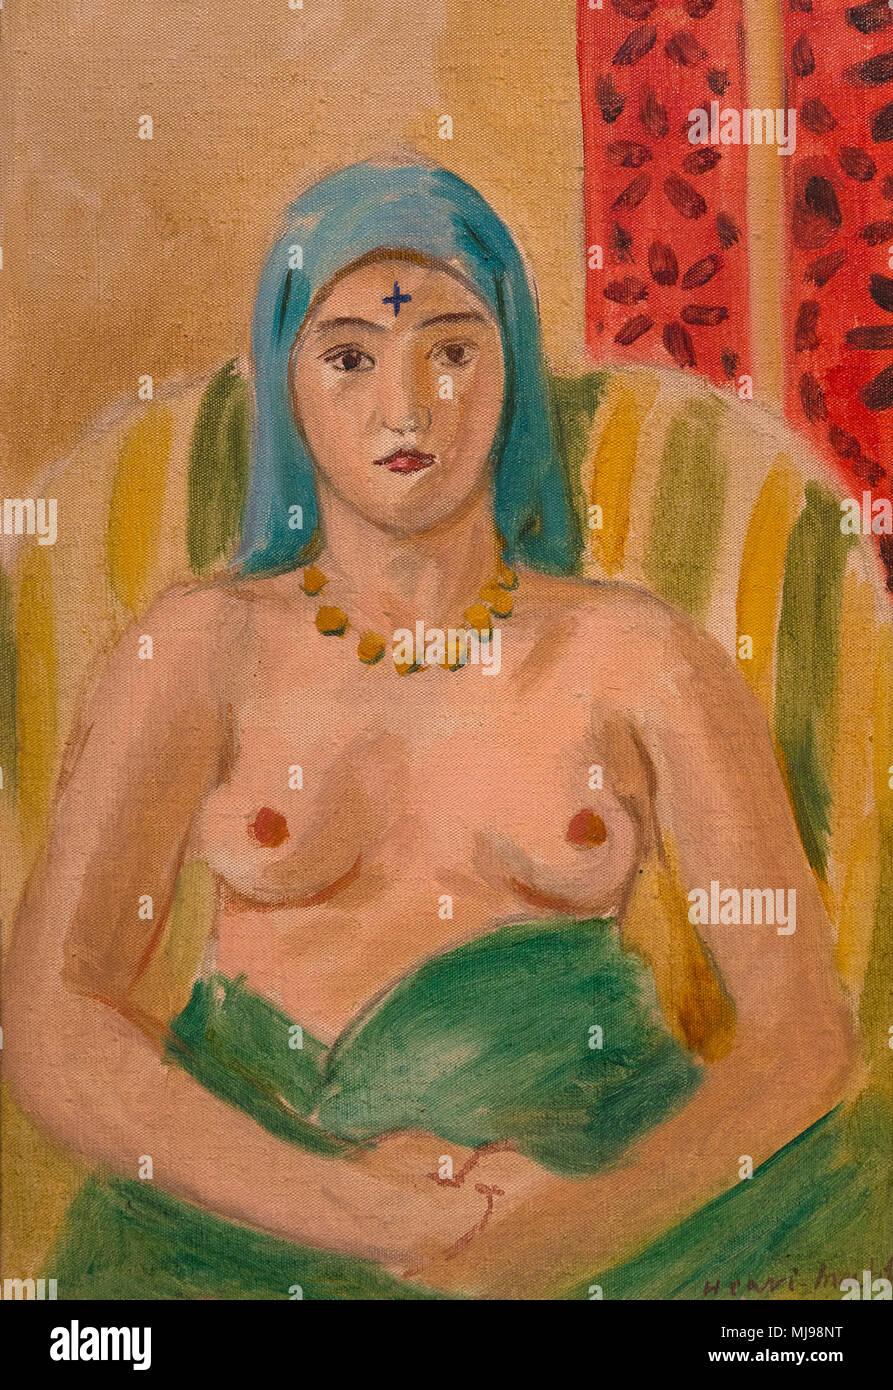 Odalisque, Half-Length, The Tattoo, Henri Matisse, 1923, National Gallery of Art, Washington DC, USA, North America - Stock Image